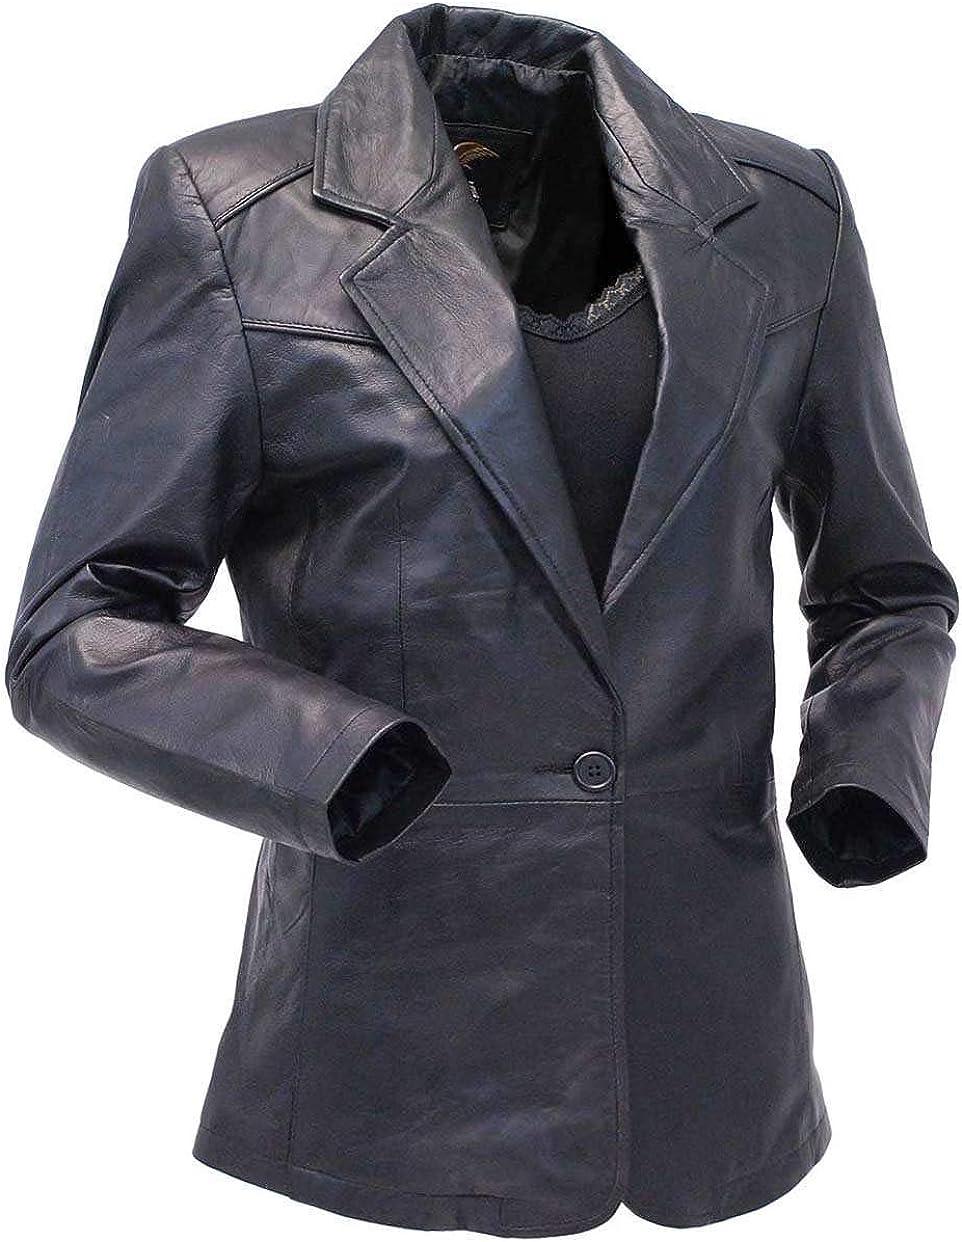 Jamin' Leather - 送料無料激安祭 Single Button 世界の人気ブランド Premium Black Blazer for